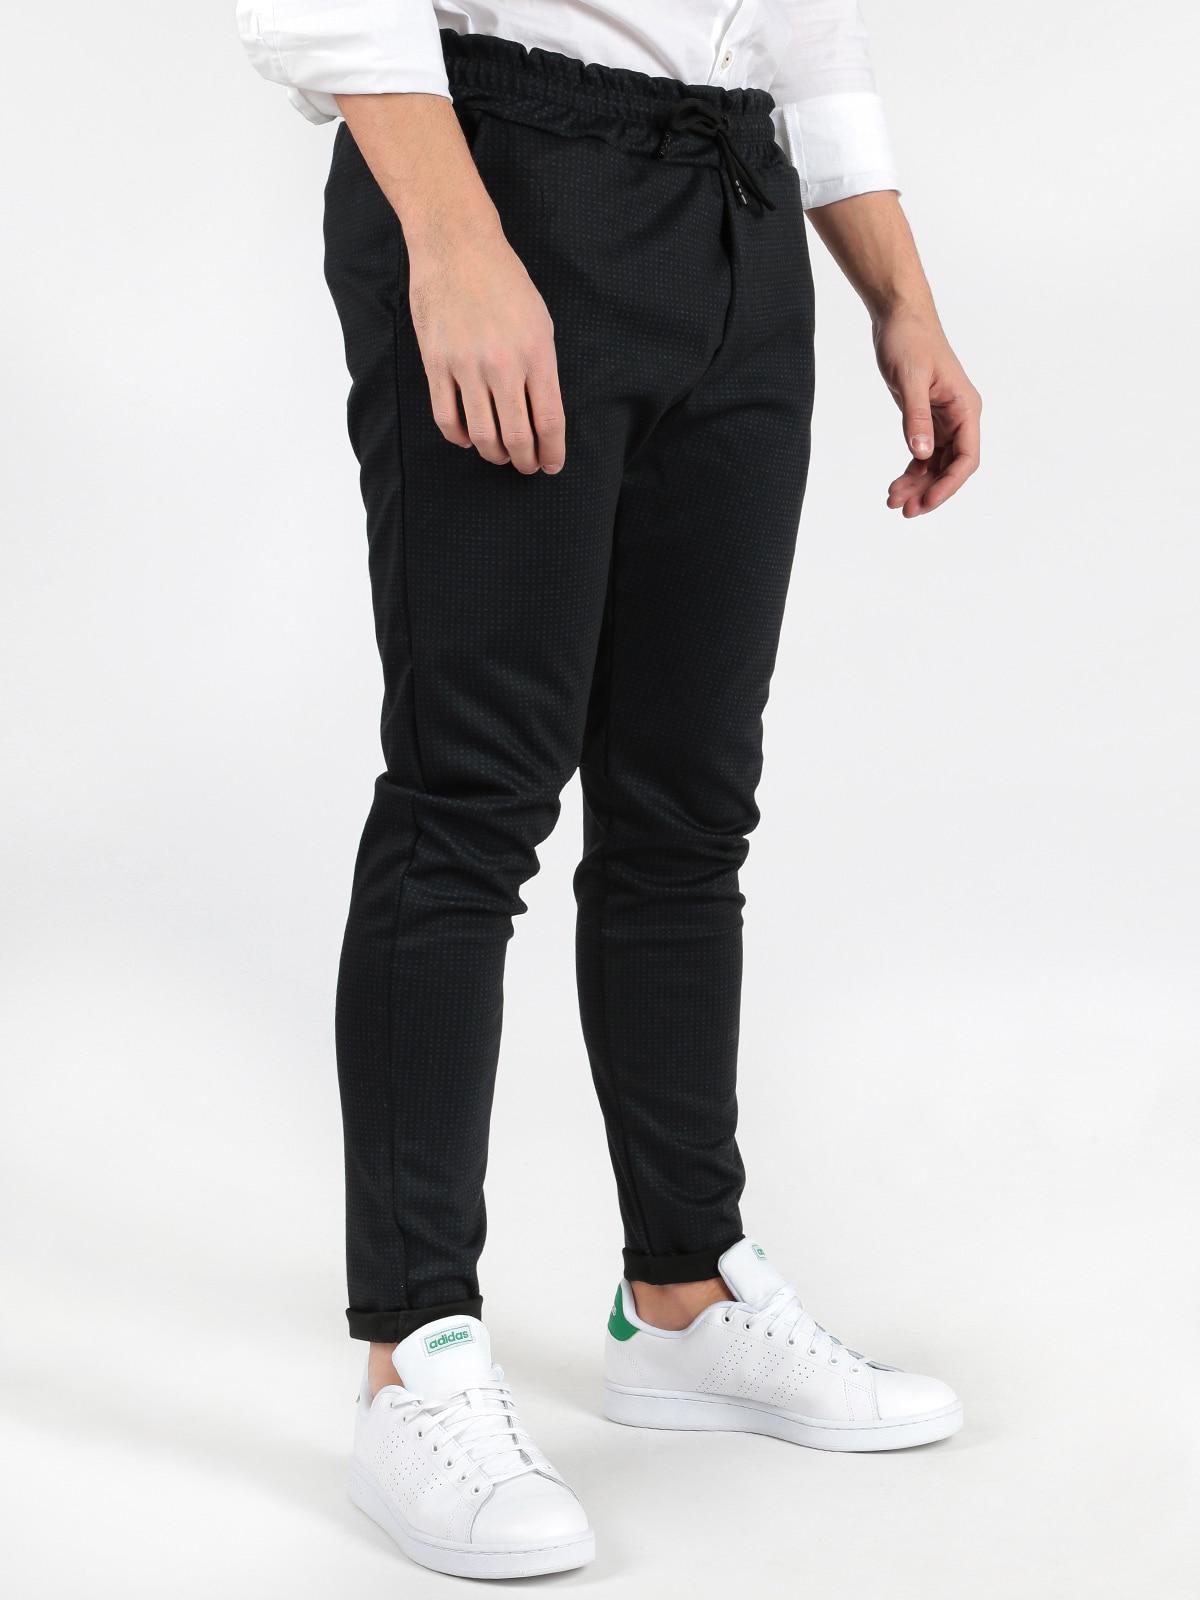 Pants With Microfantasia Printed